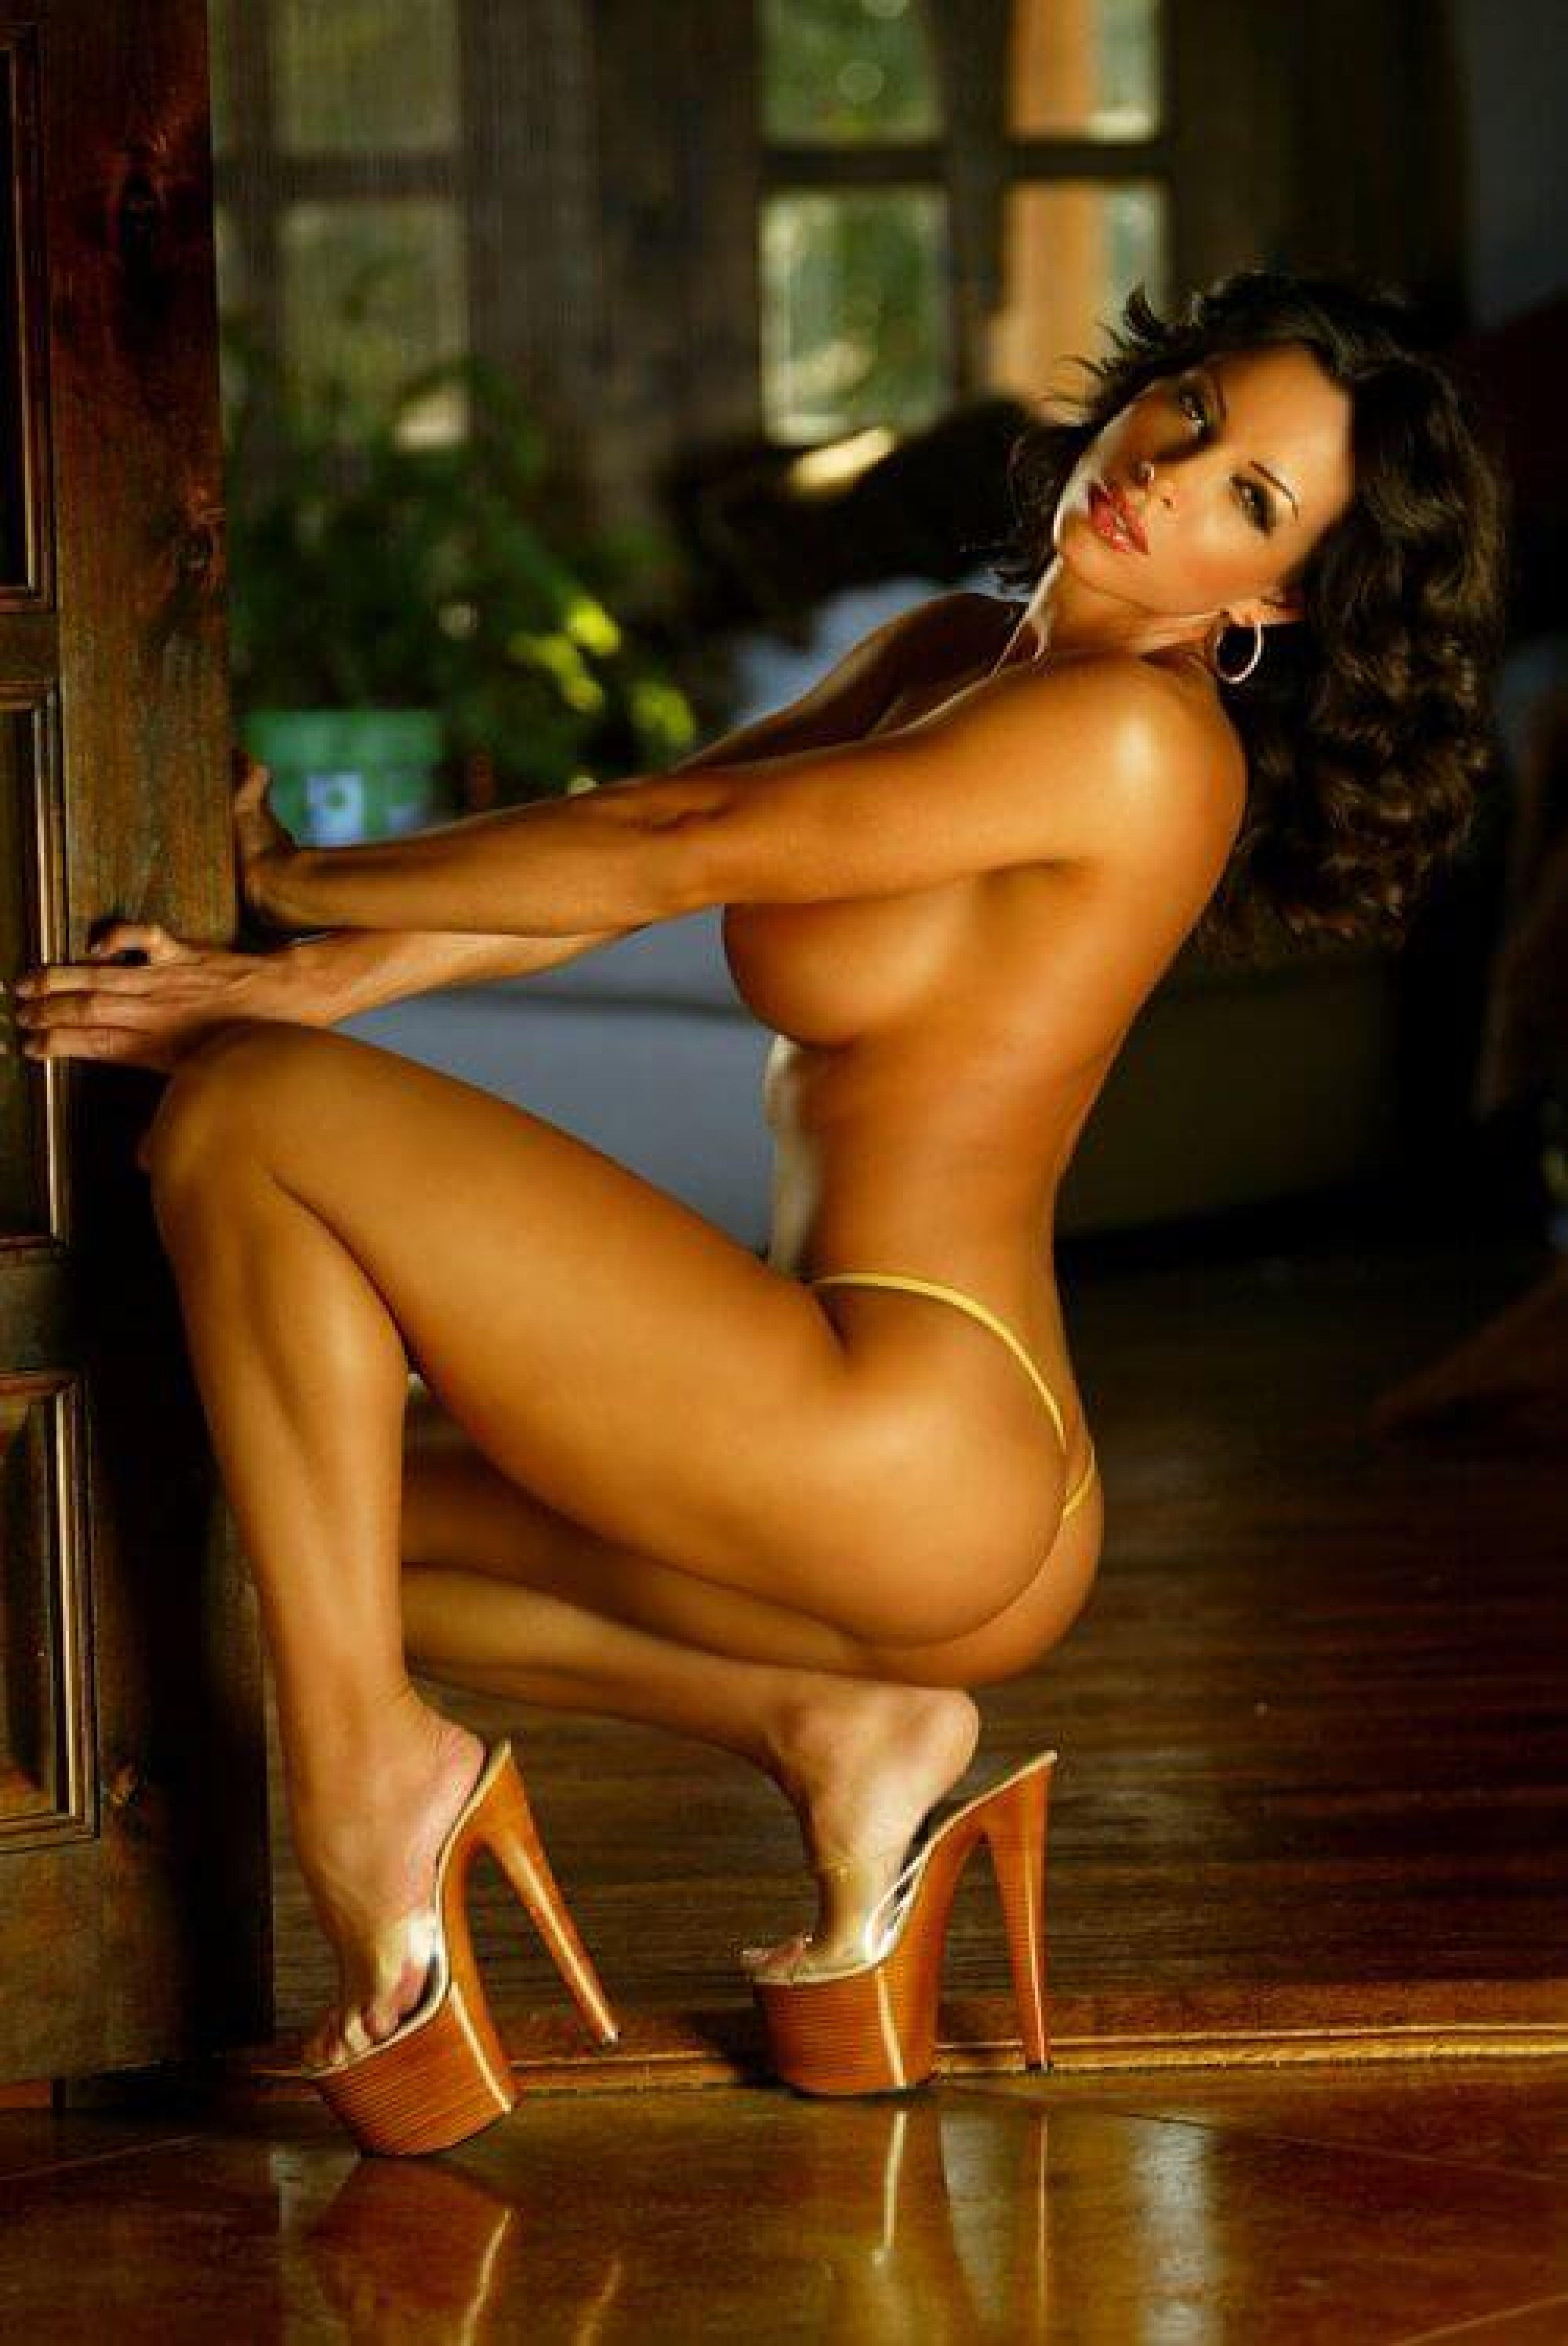 Download Female Ffitness Model Ava Cowan Photos Wallpaper Hq Free Uploaded By